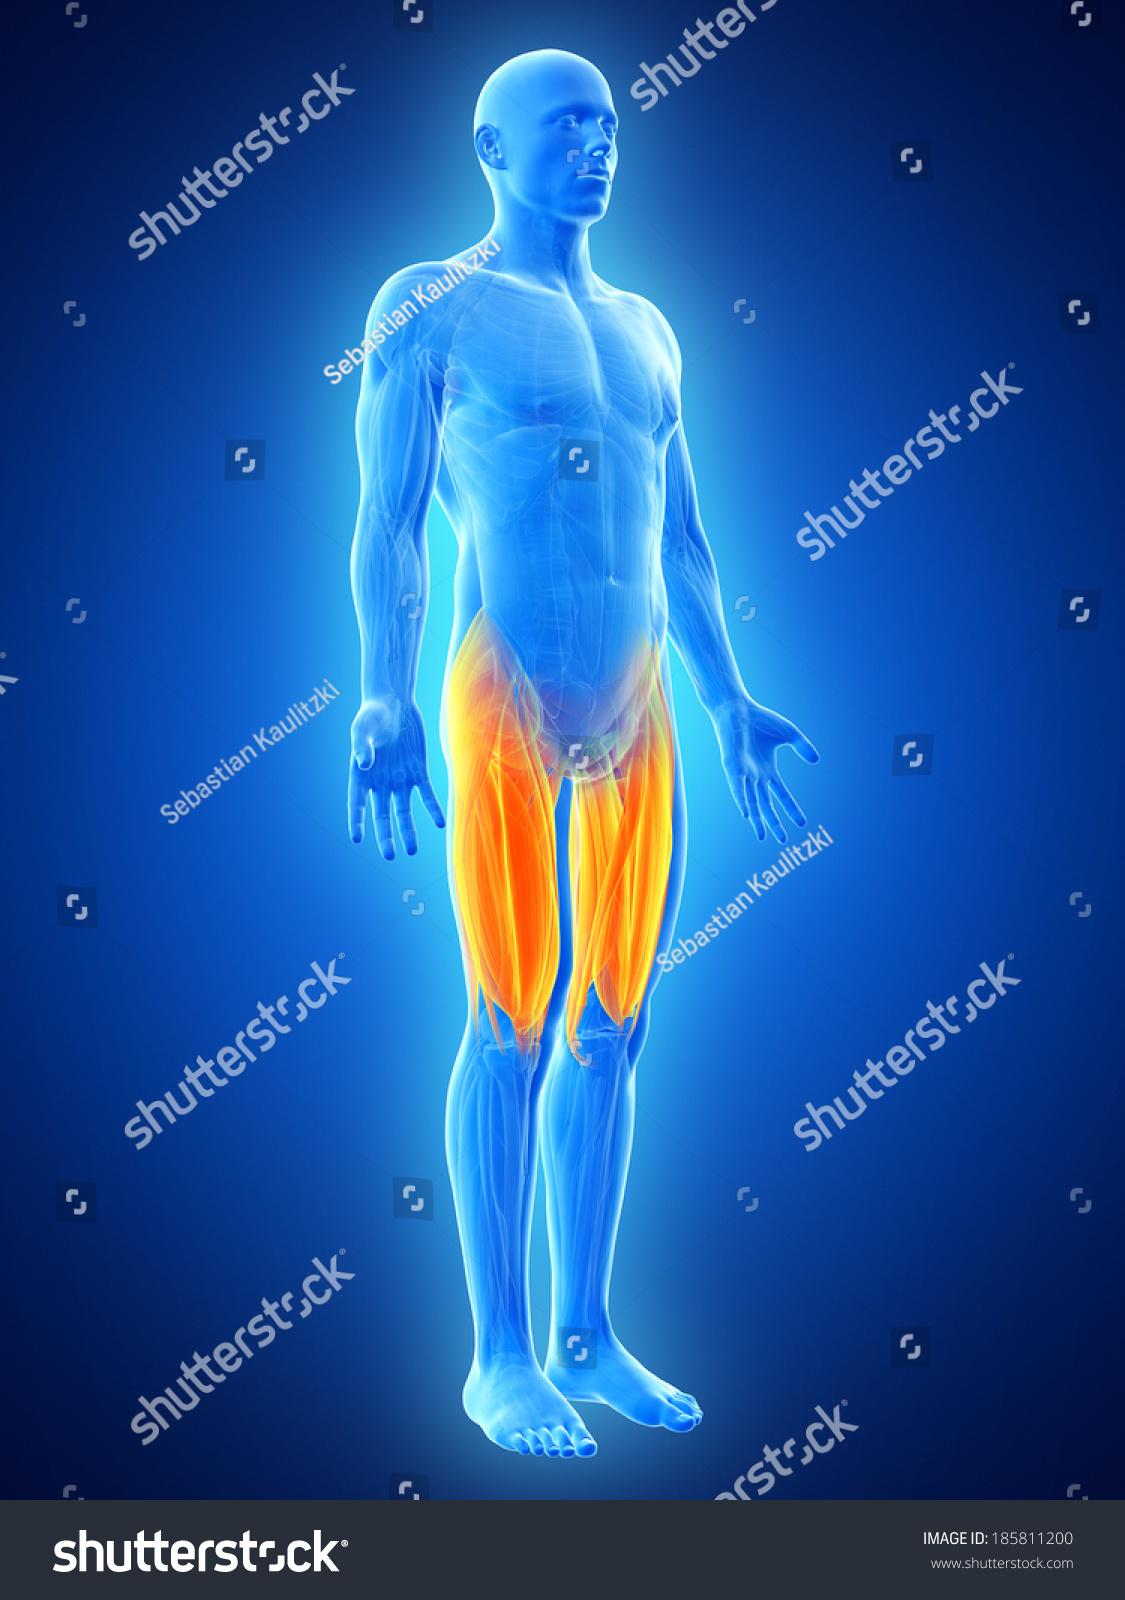 Anatomy Illustration Showing Upper Leg Muscles Stock Illustration ...